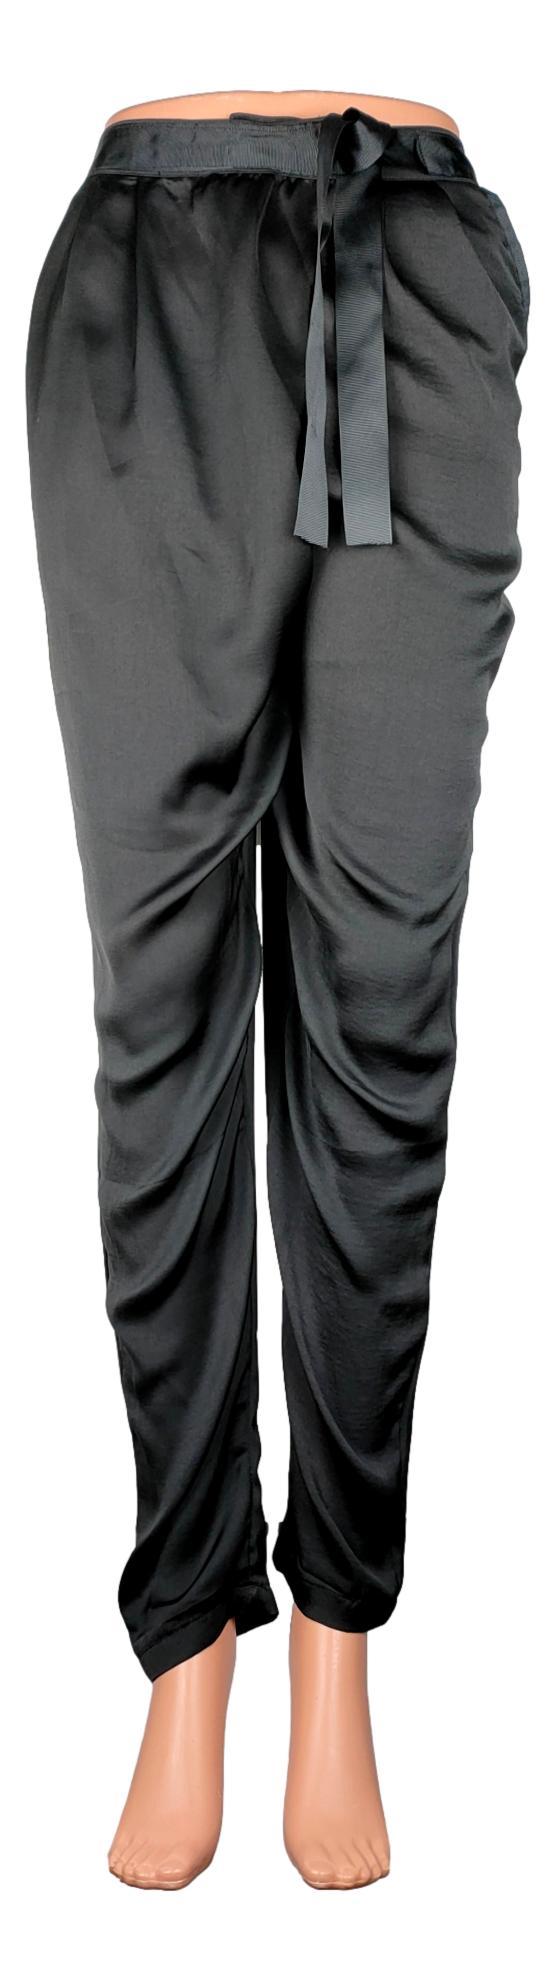 Pantalon Vila - Taille M